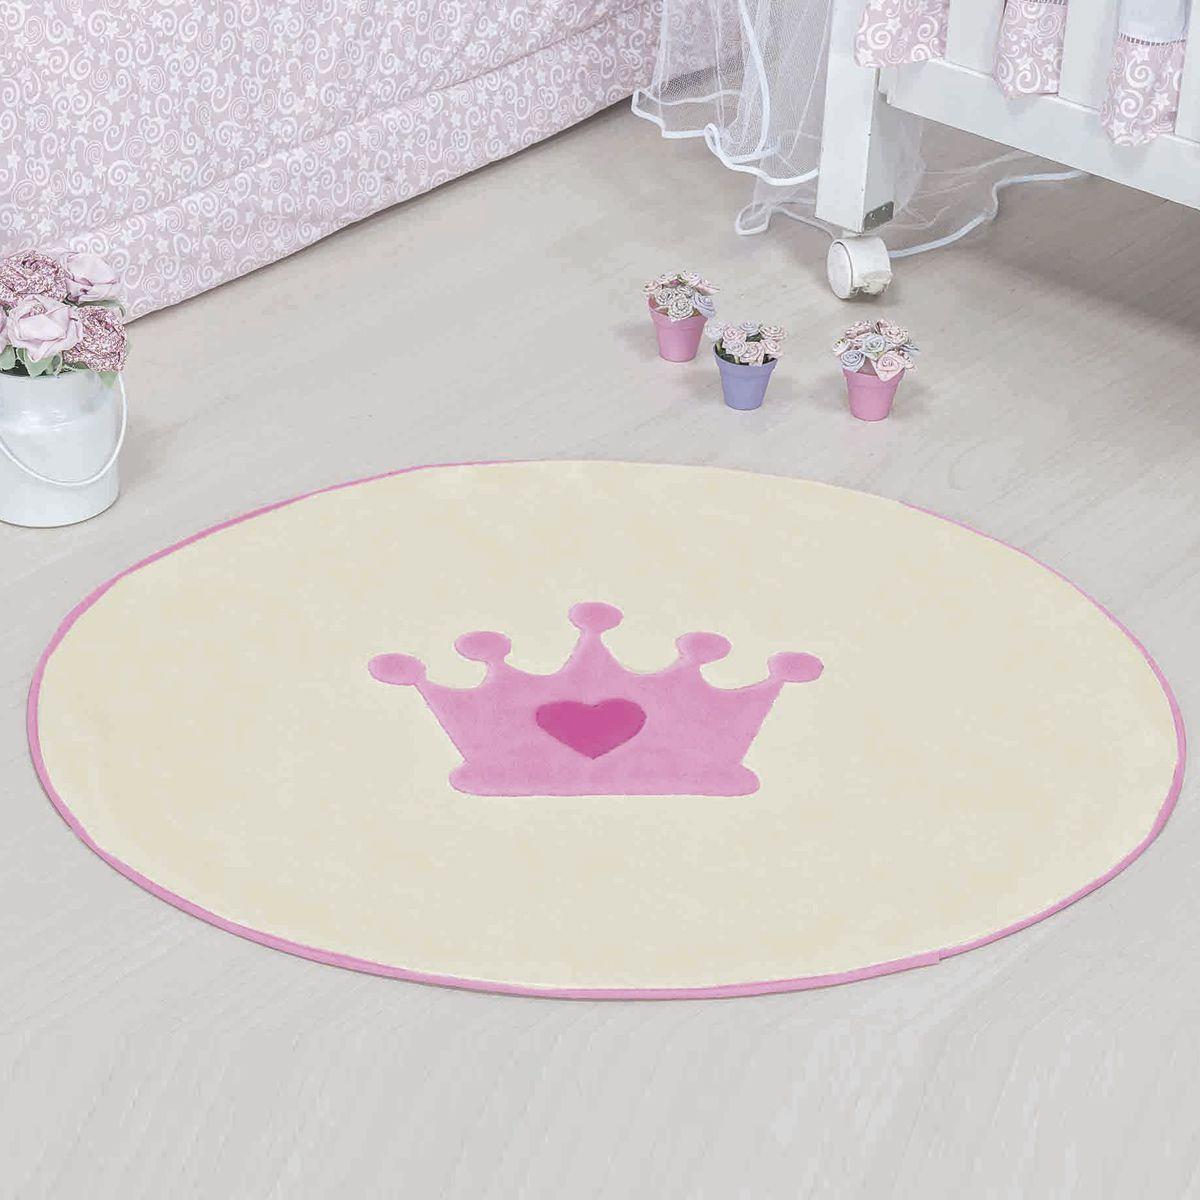 Tapete Infantil Premium Formato Coroa Baby Rosa 78cm x 68cm